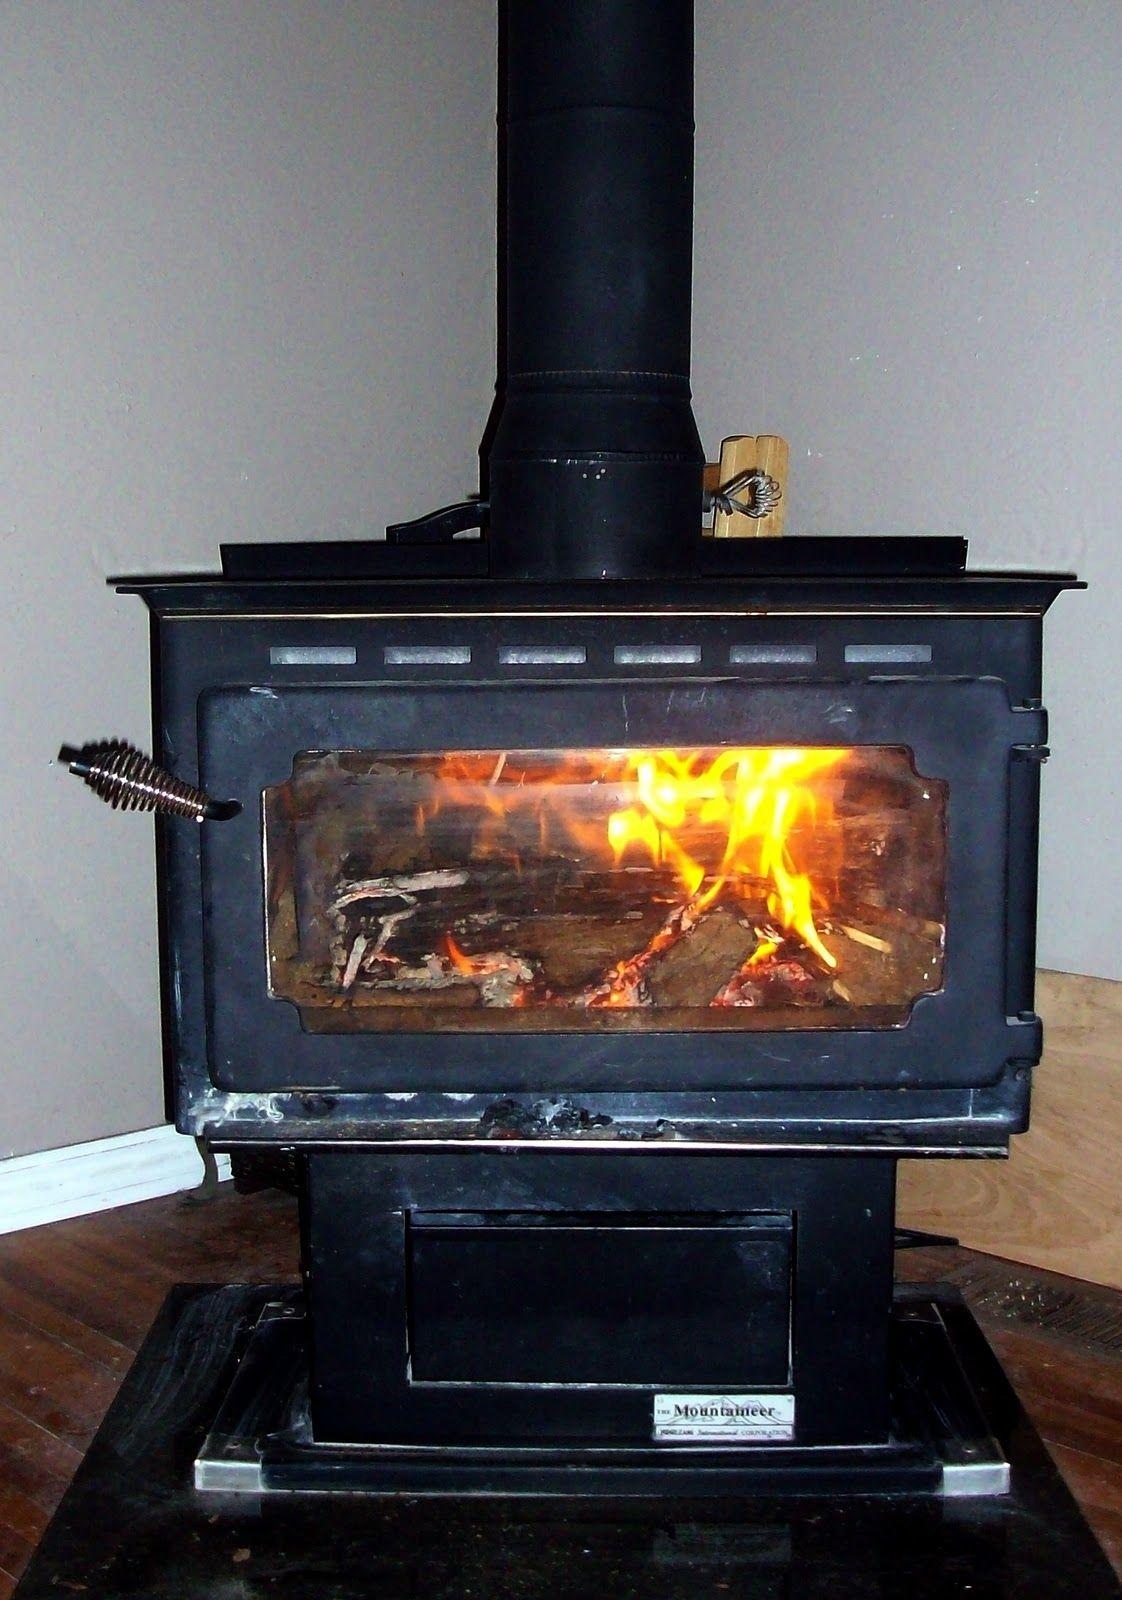 Google Image Result For Http 4 Bp Blogspot Com Brqyplkrh6m Thgvrrhnkpi Aaaaaaaabne Wvq Qm21jdm S1600 Wood 2bstove Jp Wood Stove Used Wood Burning Stove Wood